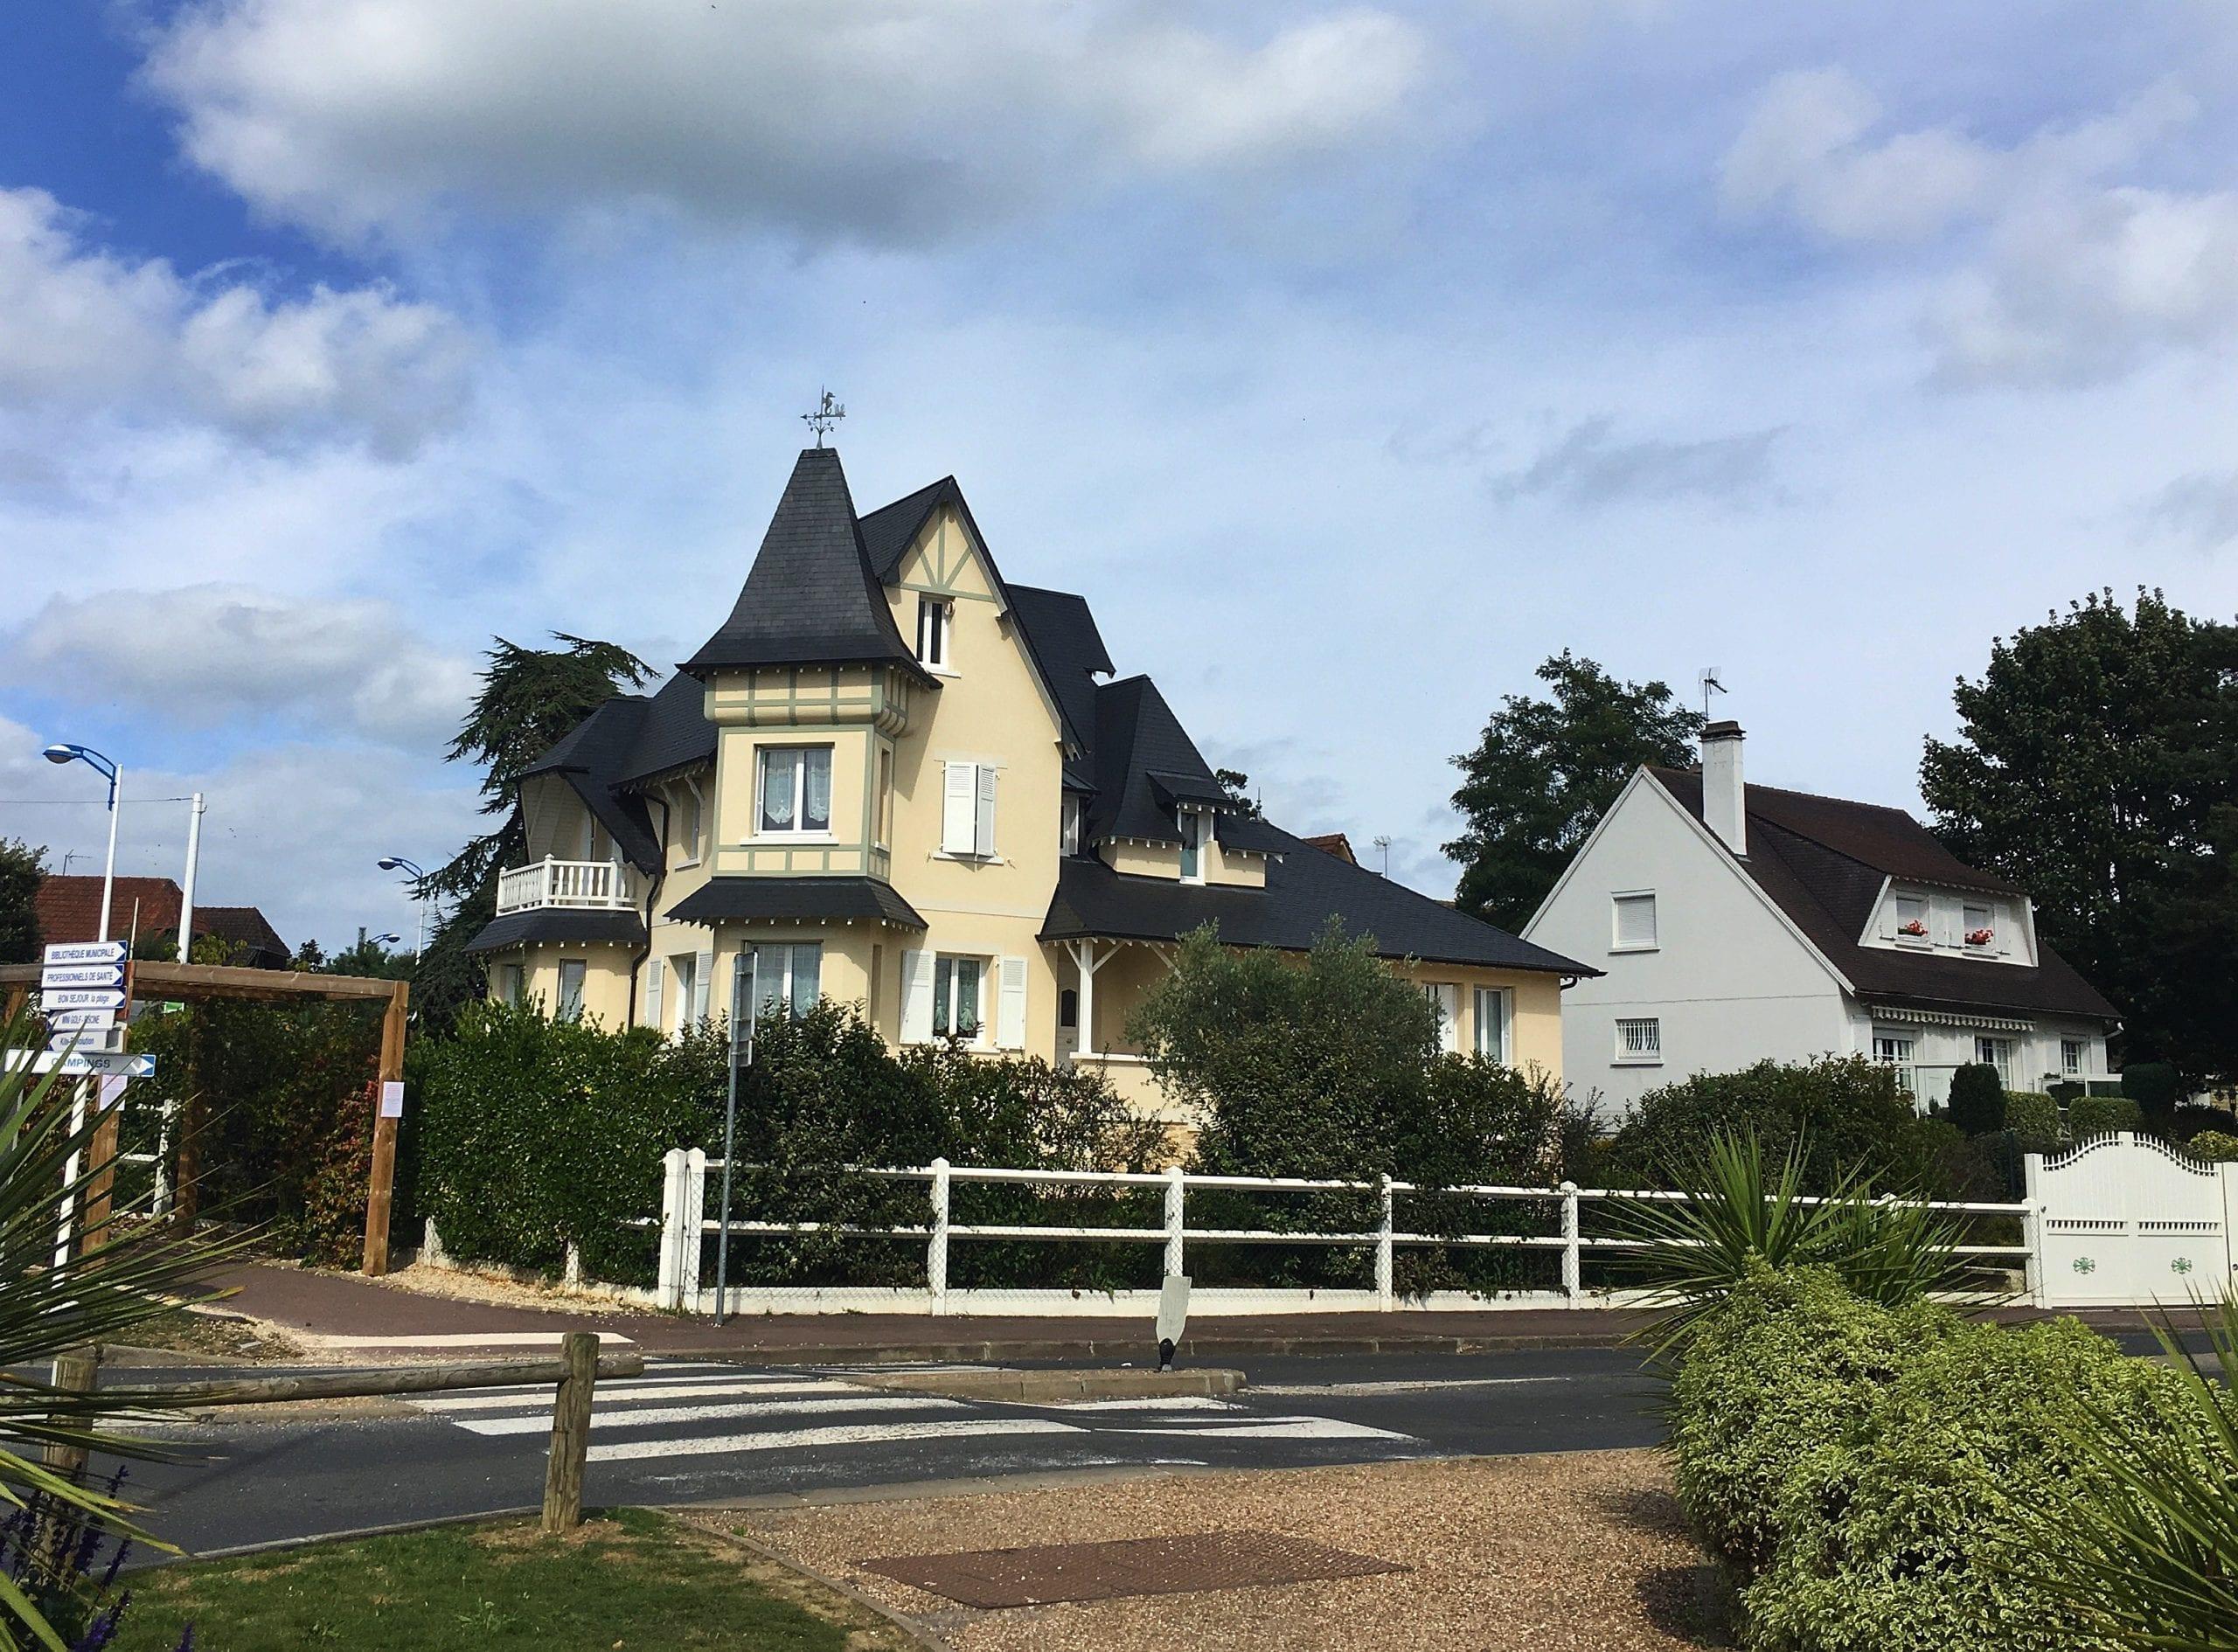 House in Merville-Franceville